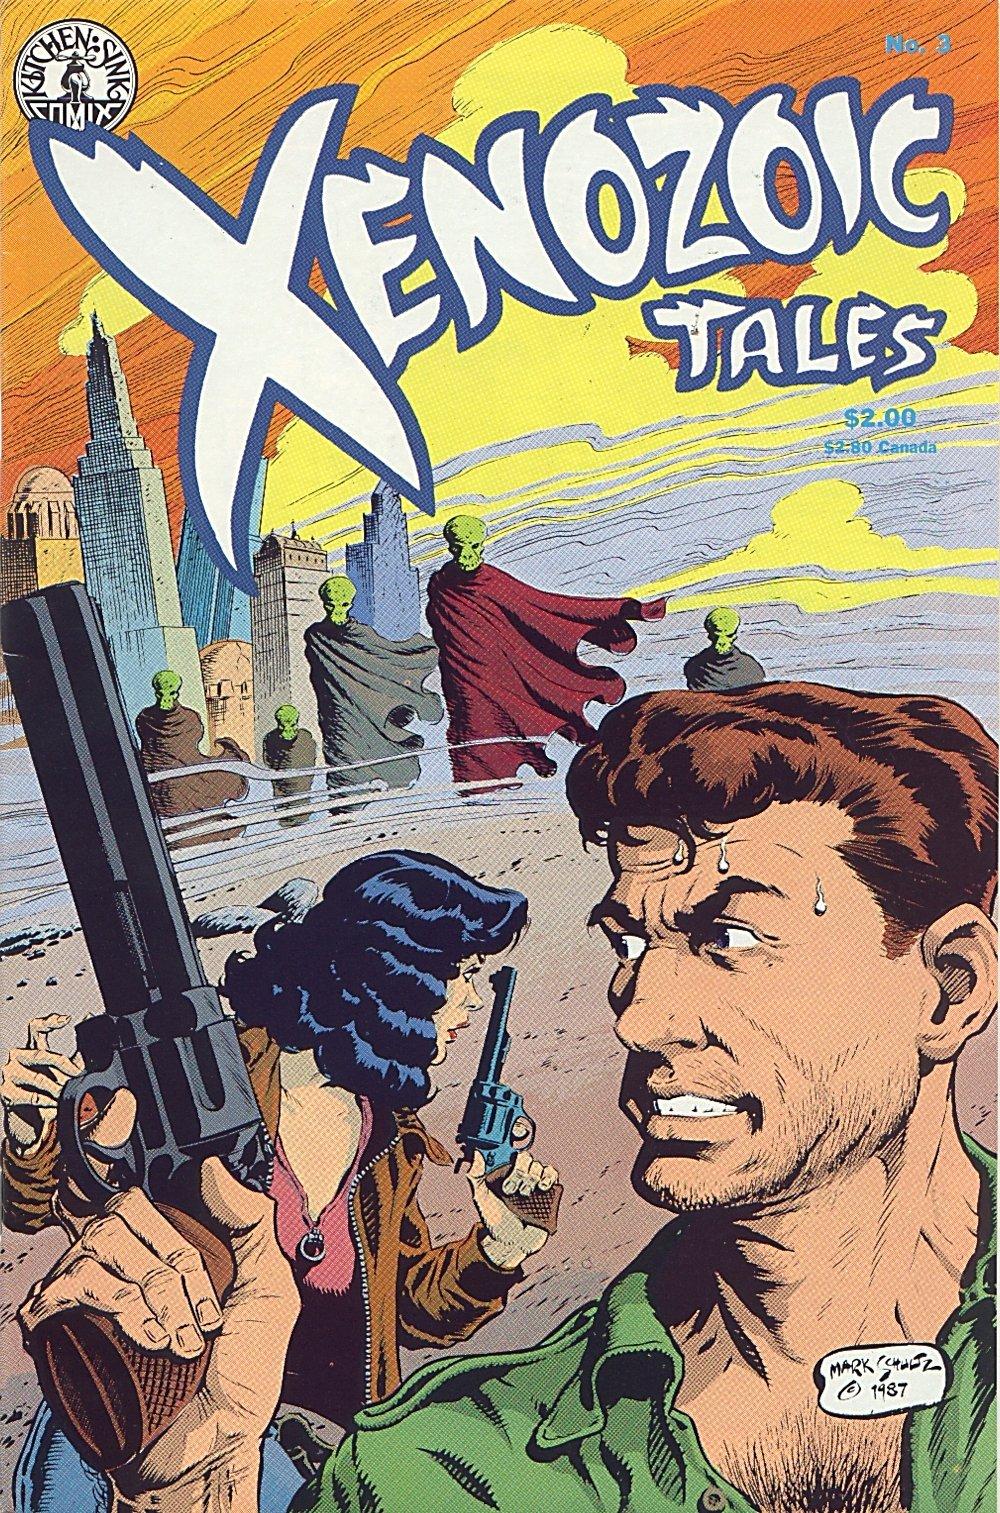 Read online Xenozoic Tales comic -  Issue #3 - 2